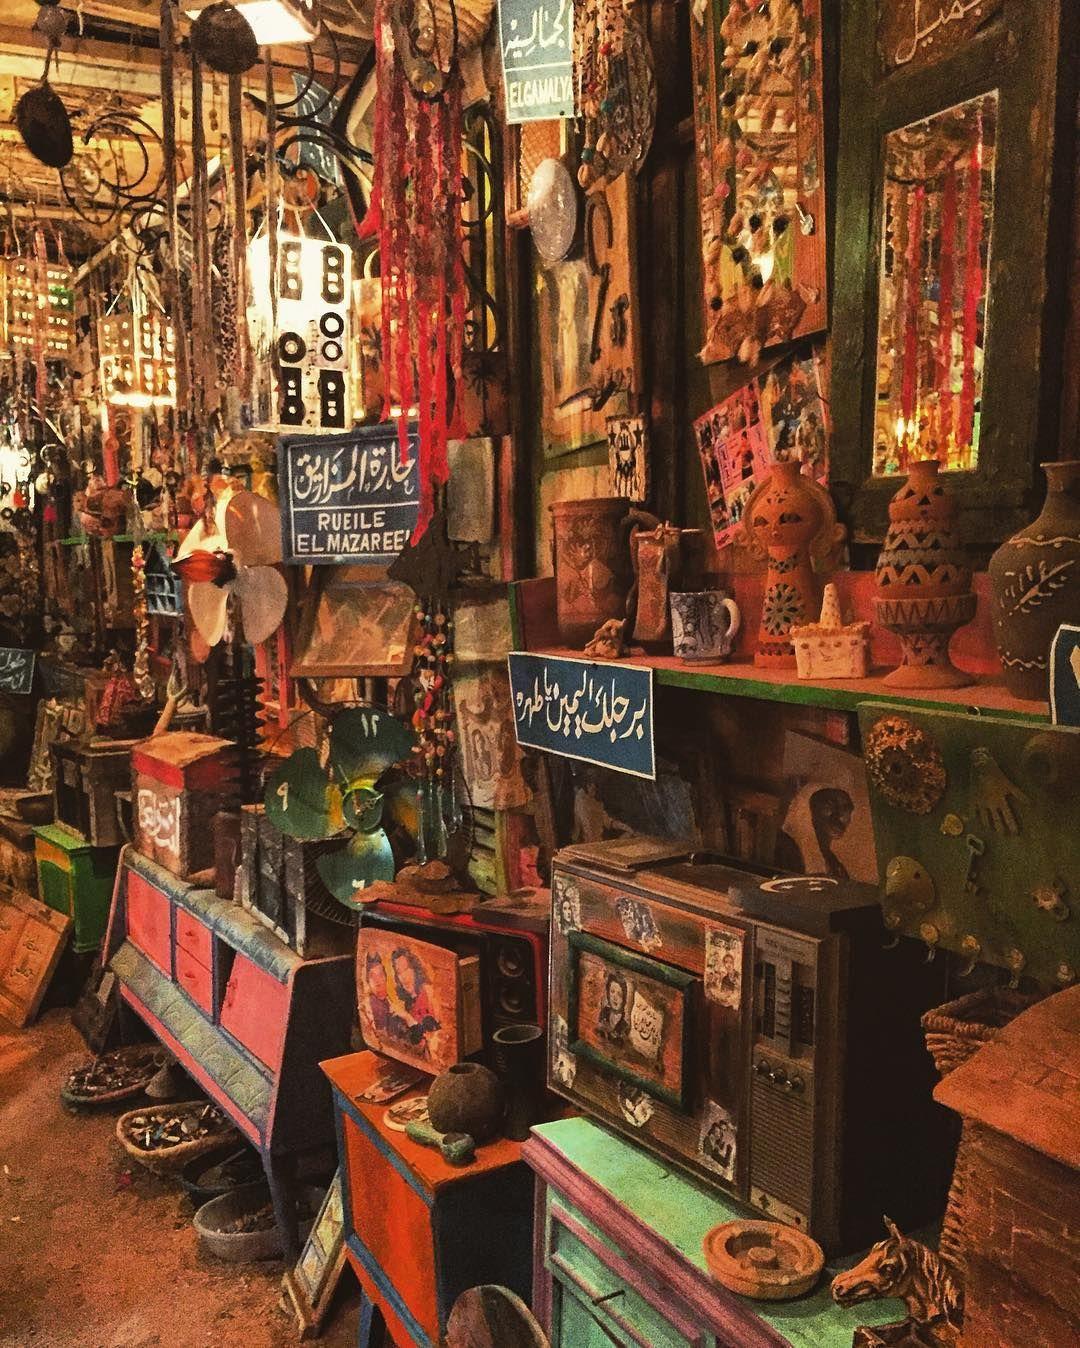 Dahab ️ #art #vintage #dahabegypt #old